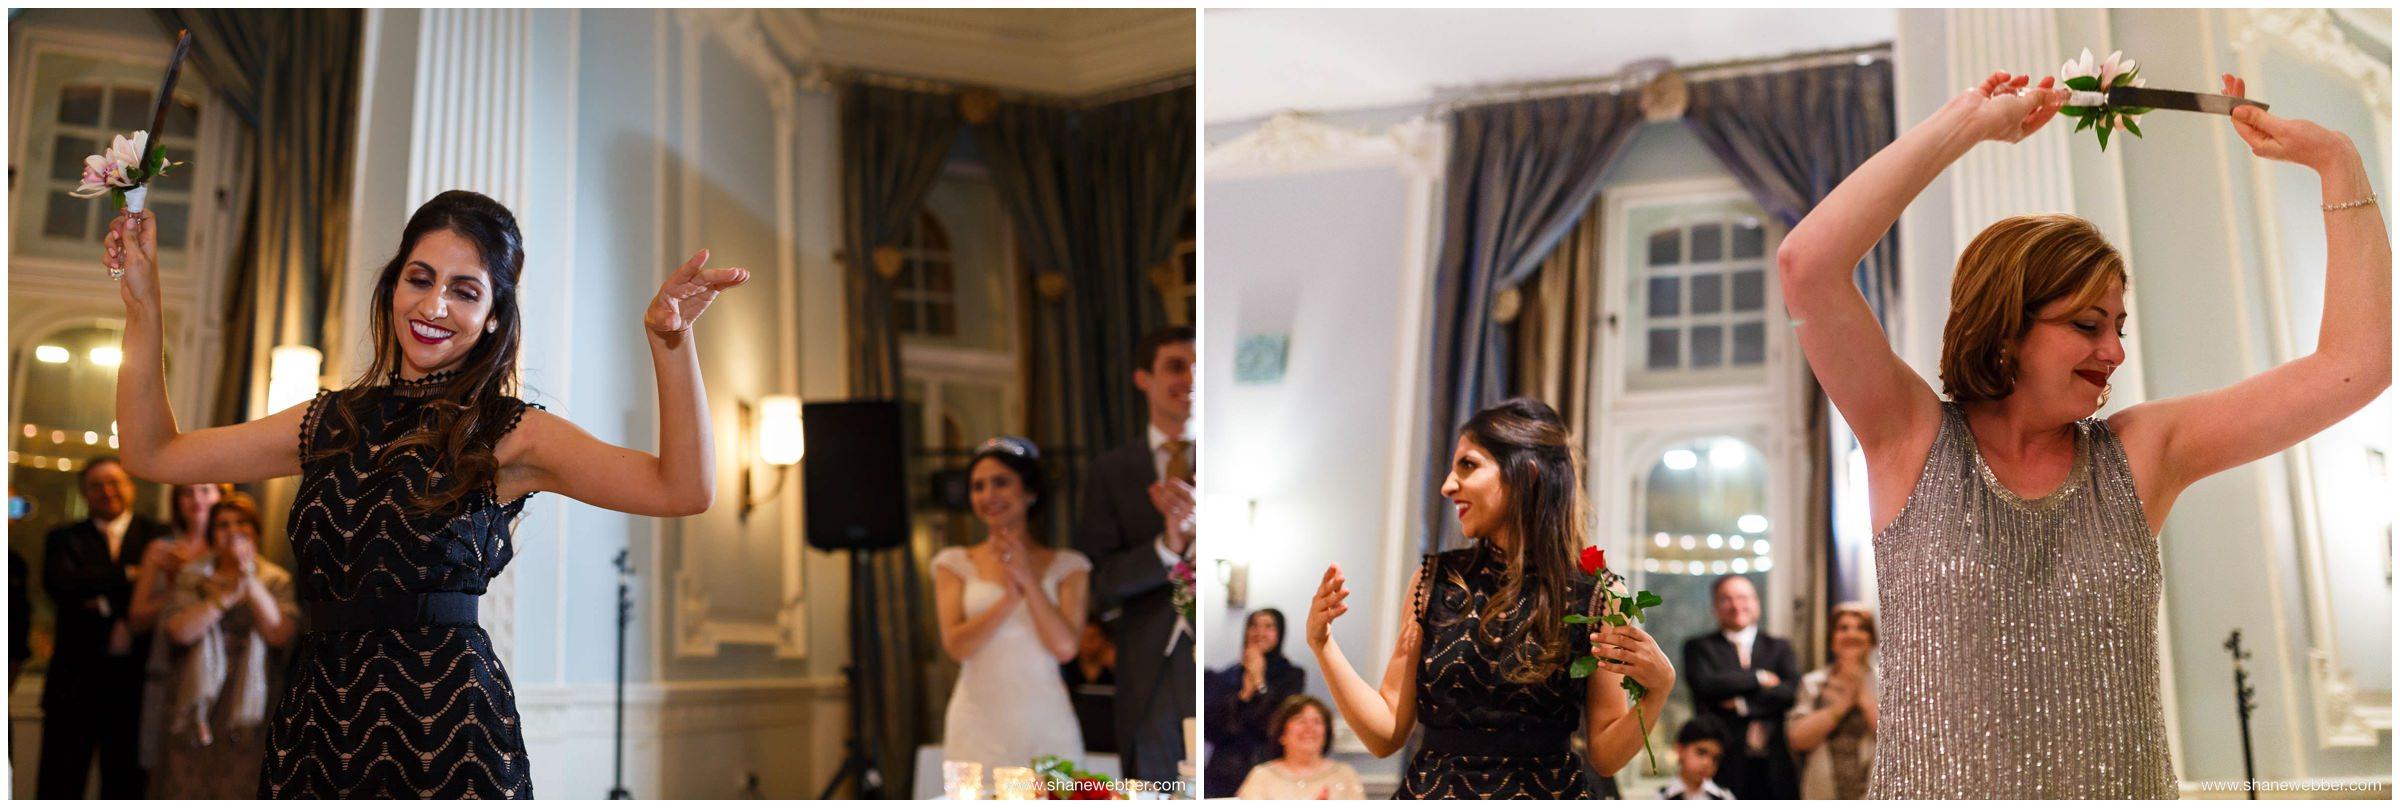 Iranian wedding reception